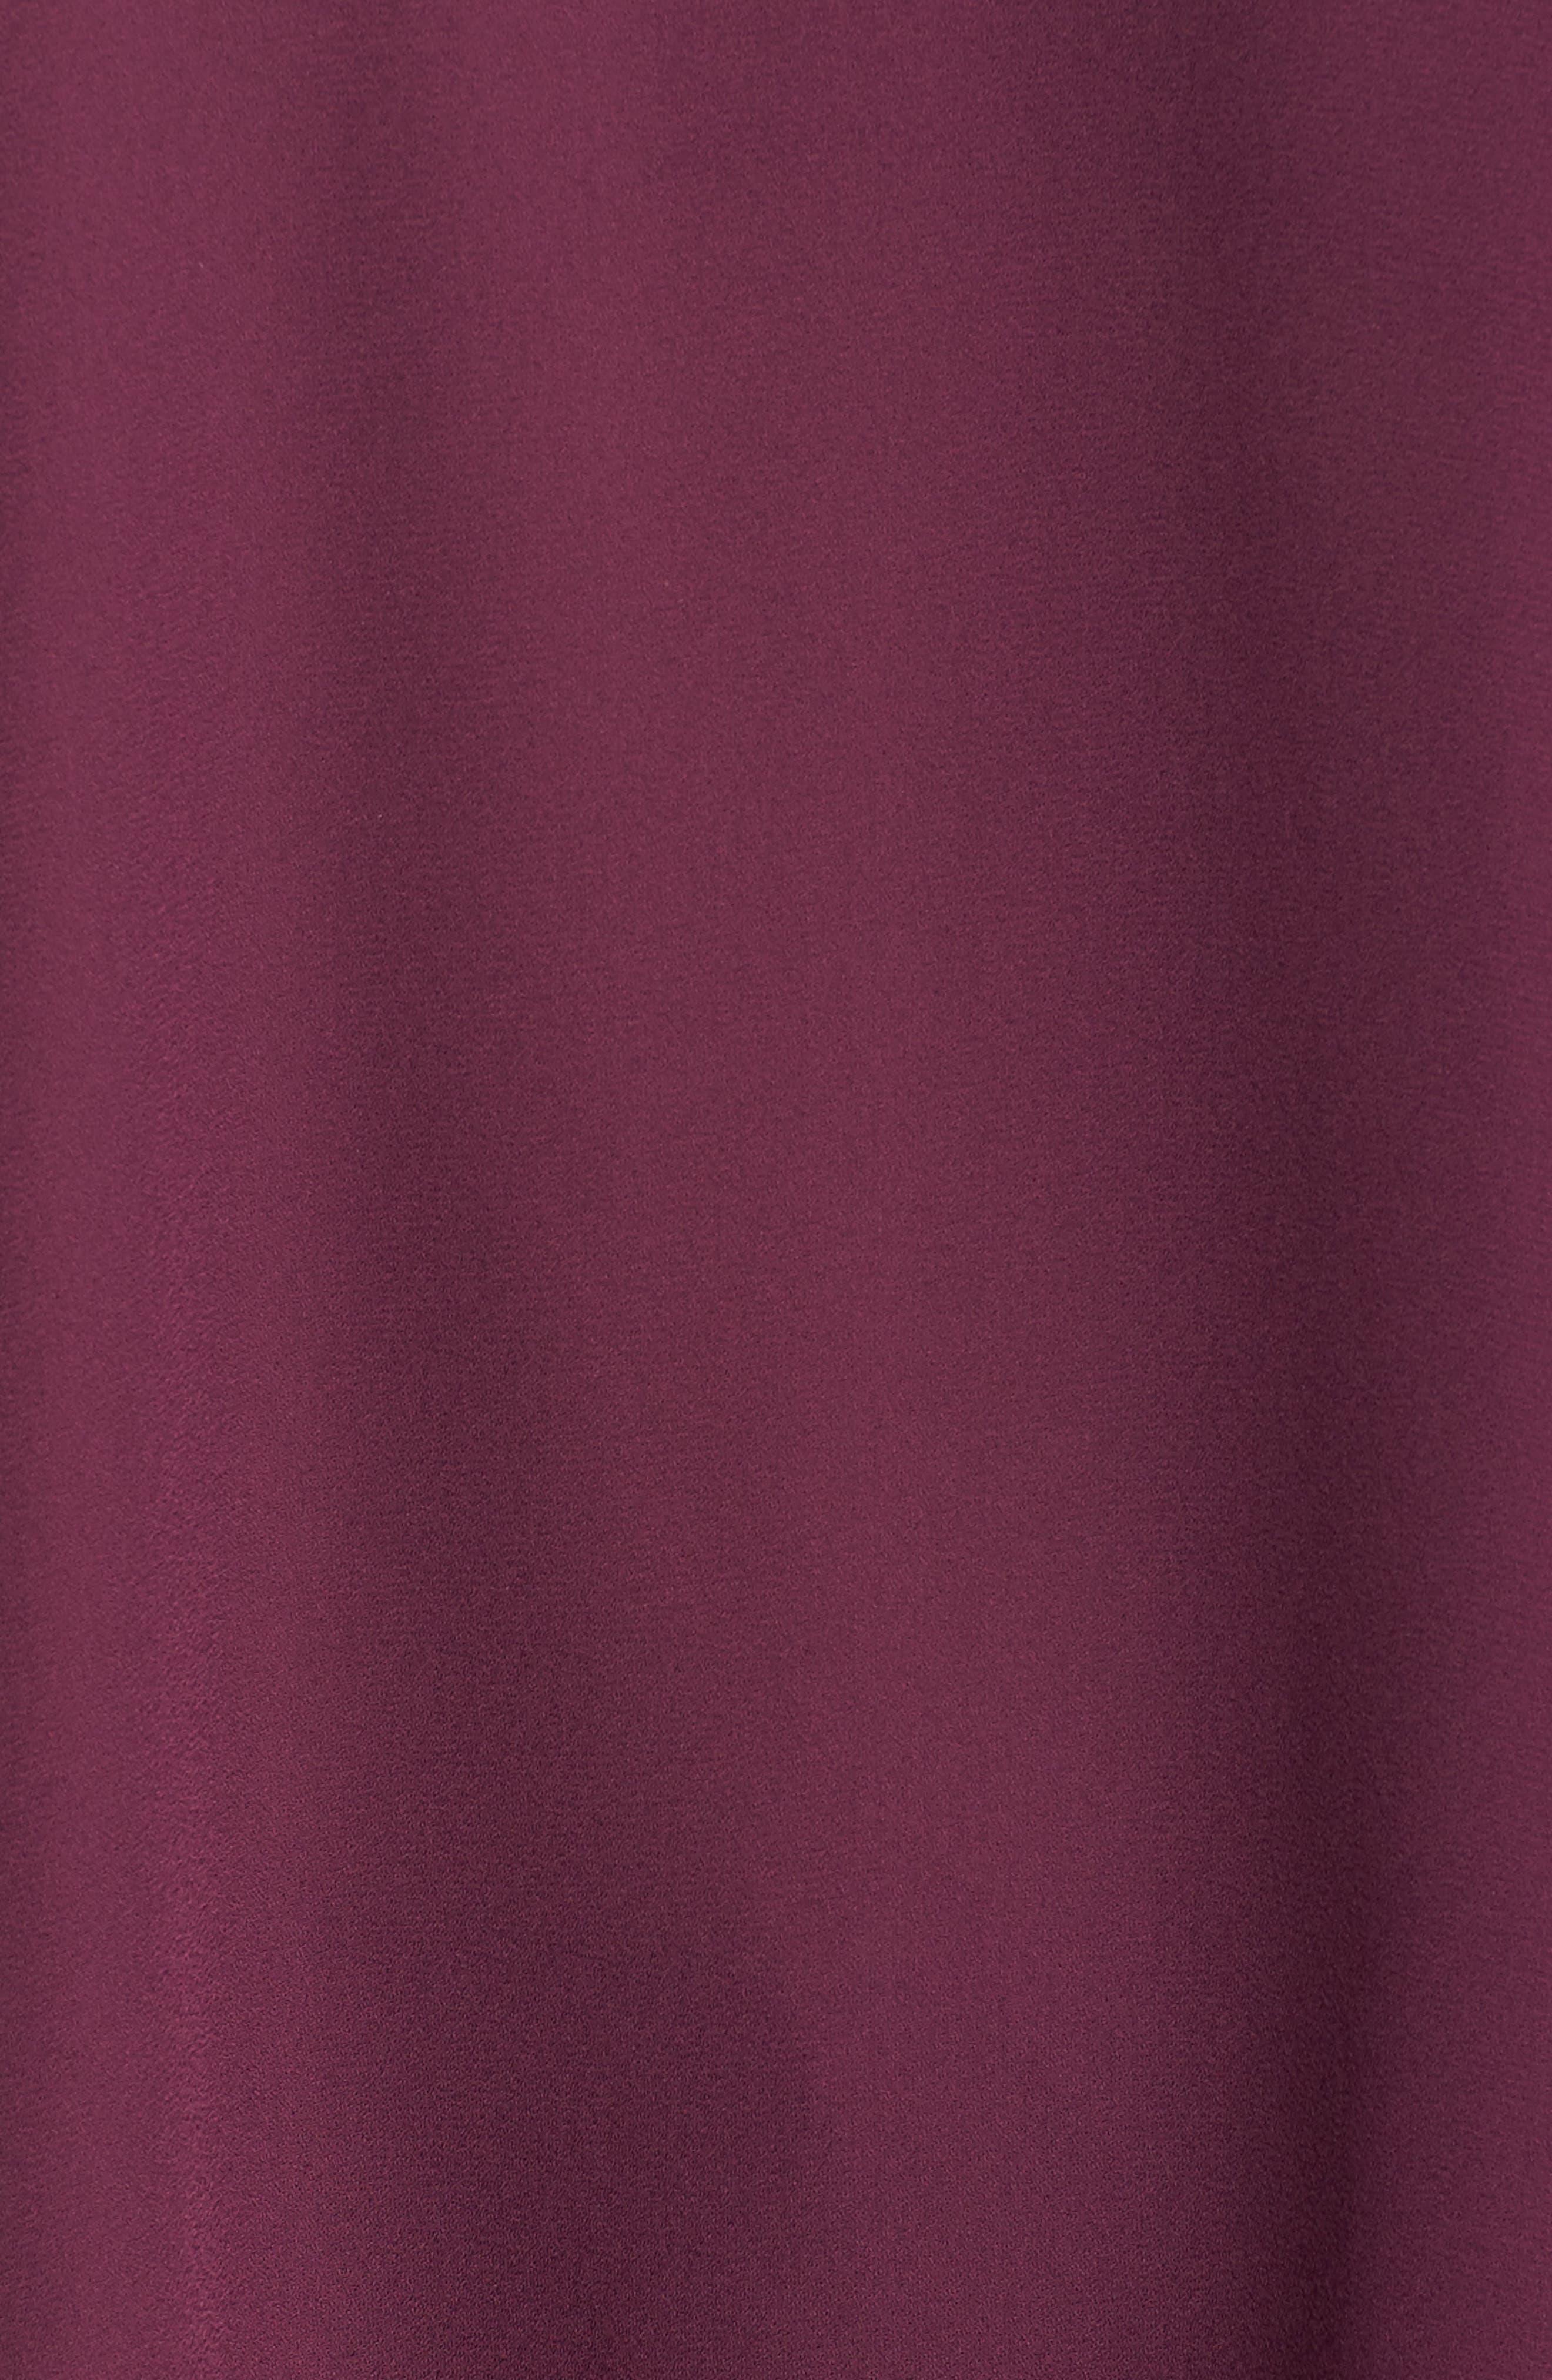 Bell Sleeve Blouse,                             Alternate thumbnail 5, color,                             651